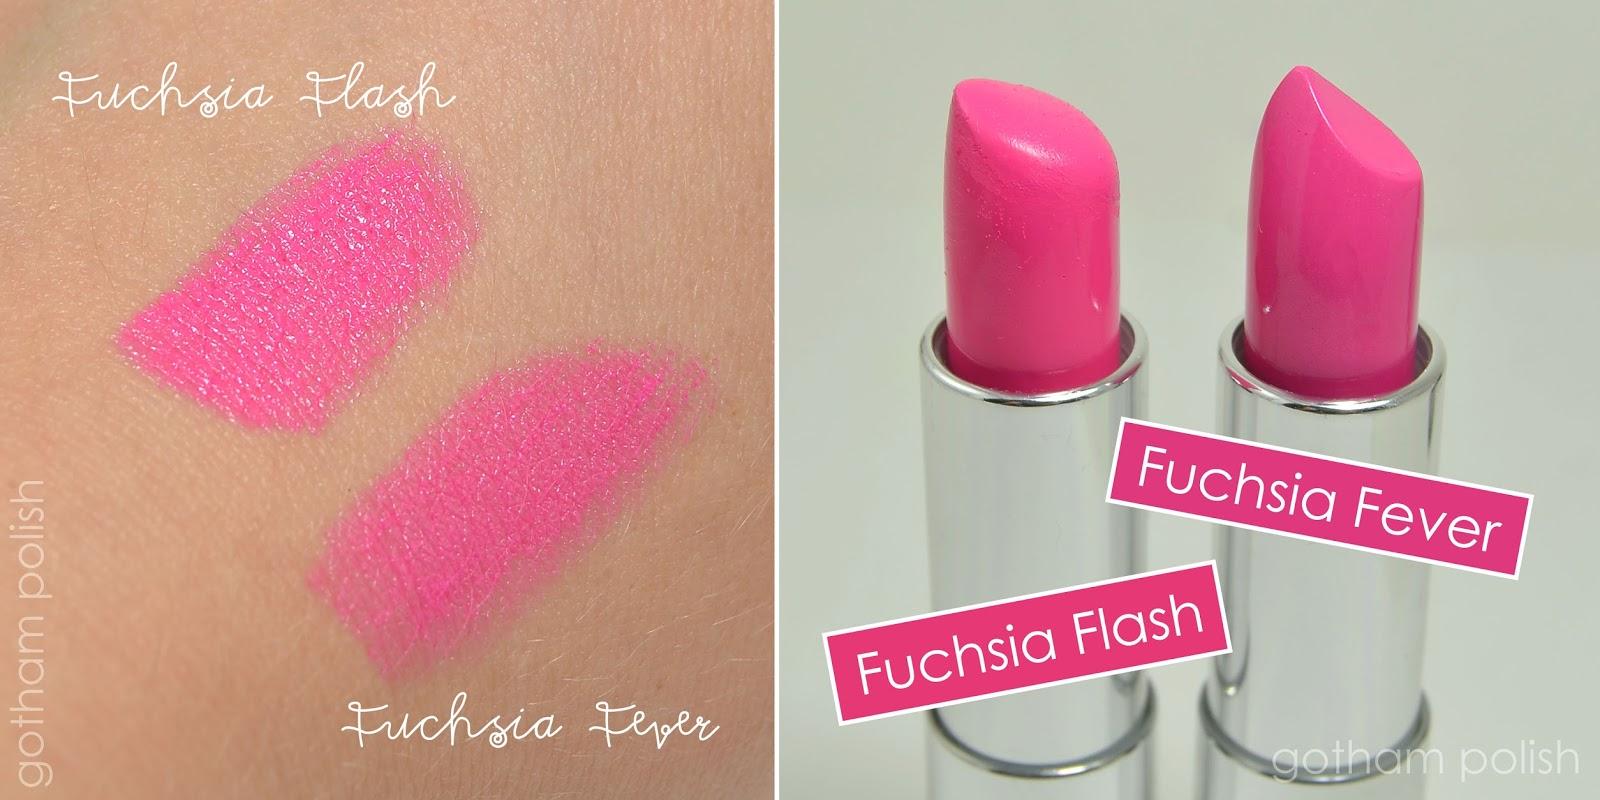 Maybelline Fuchsia Fever vs Fuchsia Flash